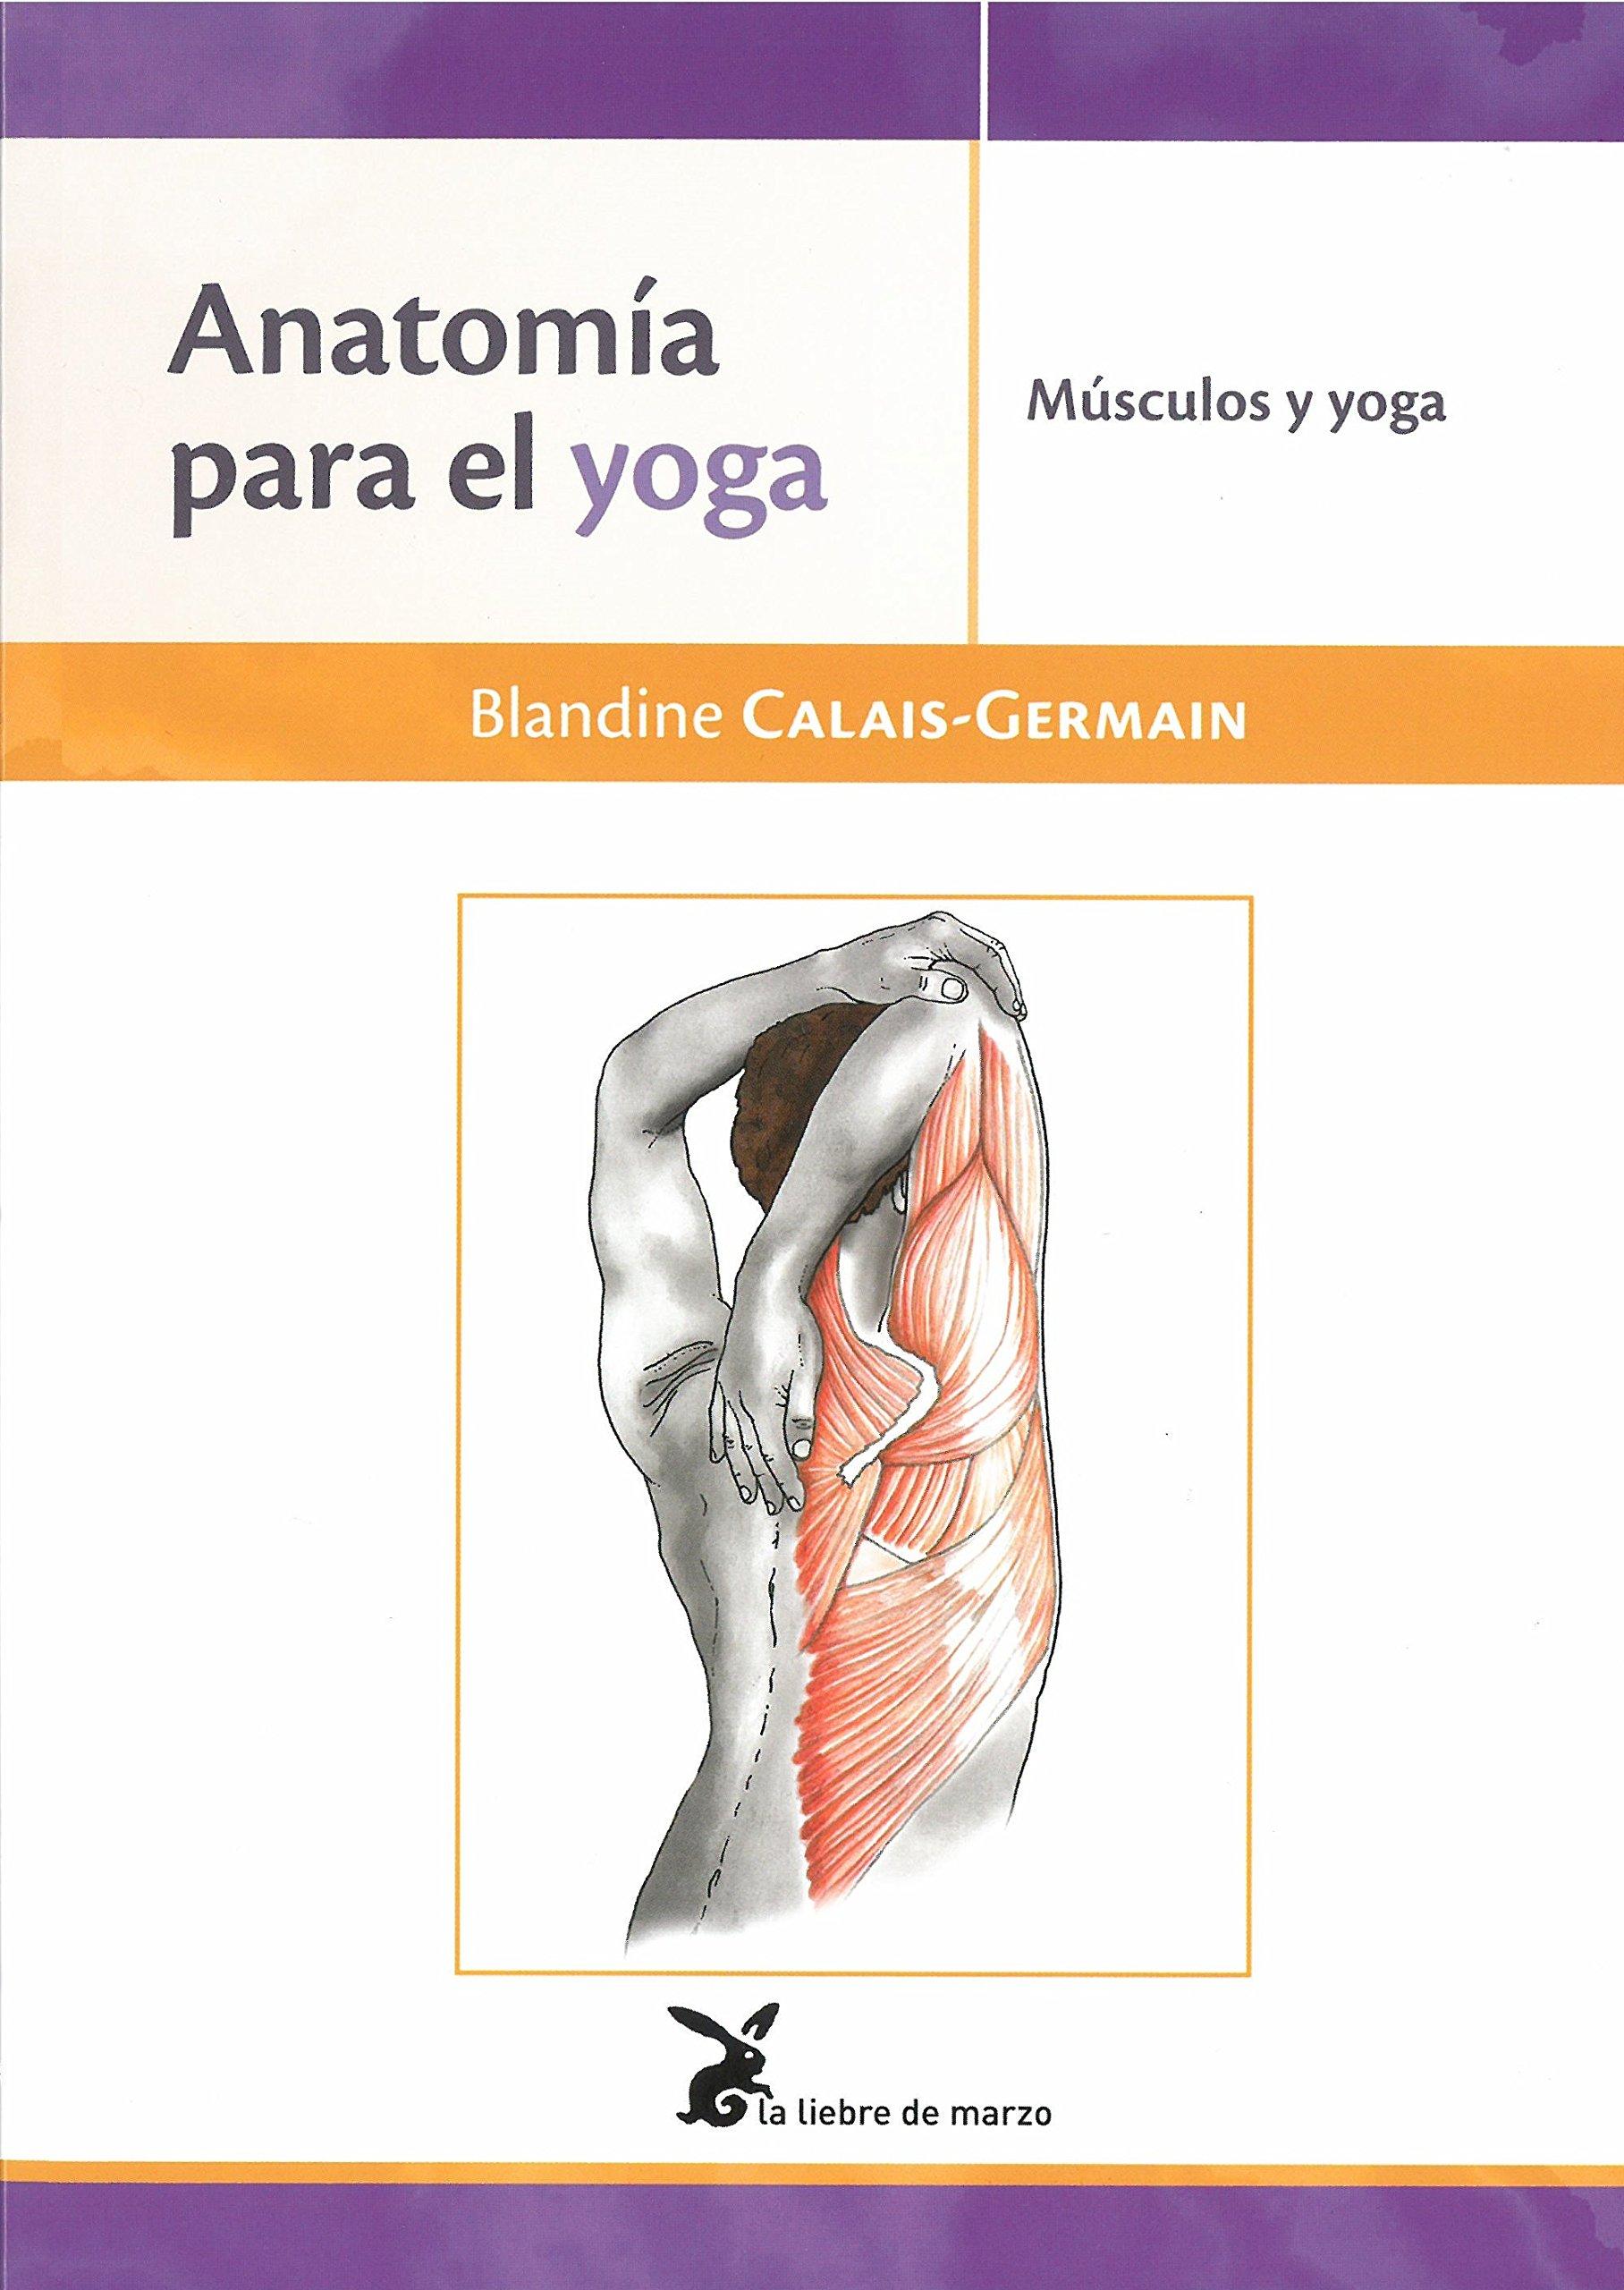 Anatomía para el yoga: Anatomía para el yoga: 9788492470532 ...